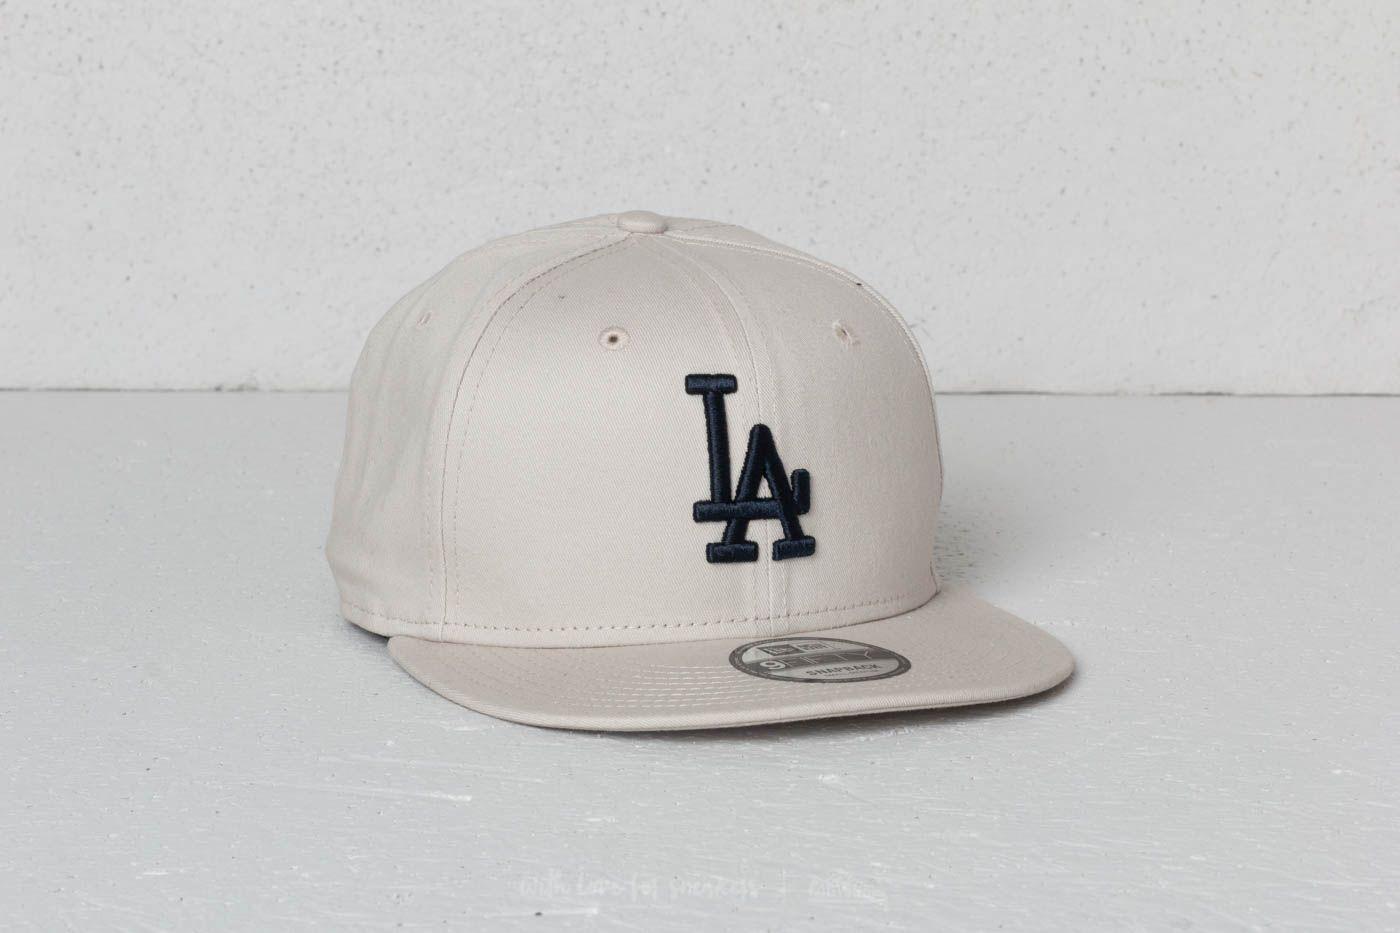 New Era 9Fifty MLB League Essential Los Angeles Dodgers Cap Satin/ Navy za skvělou cenu 459 Kč koupíte na Footshop.cz